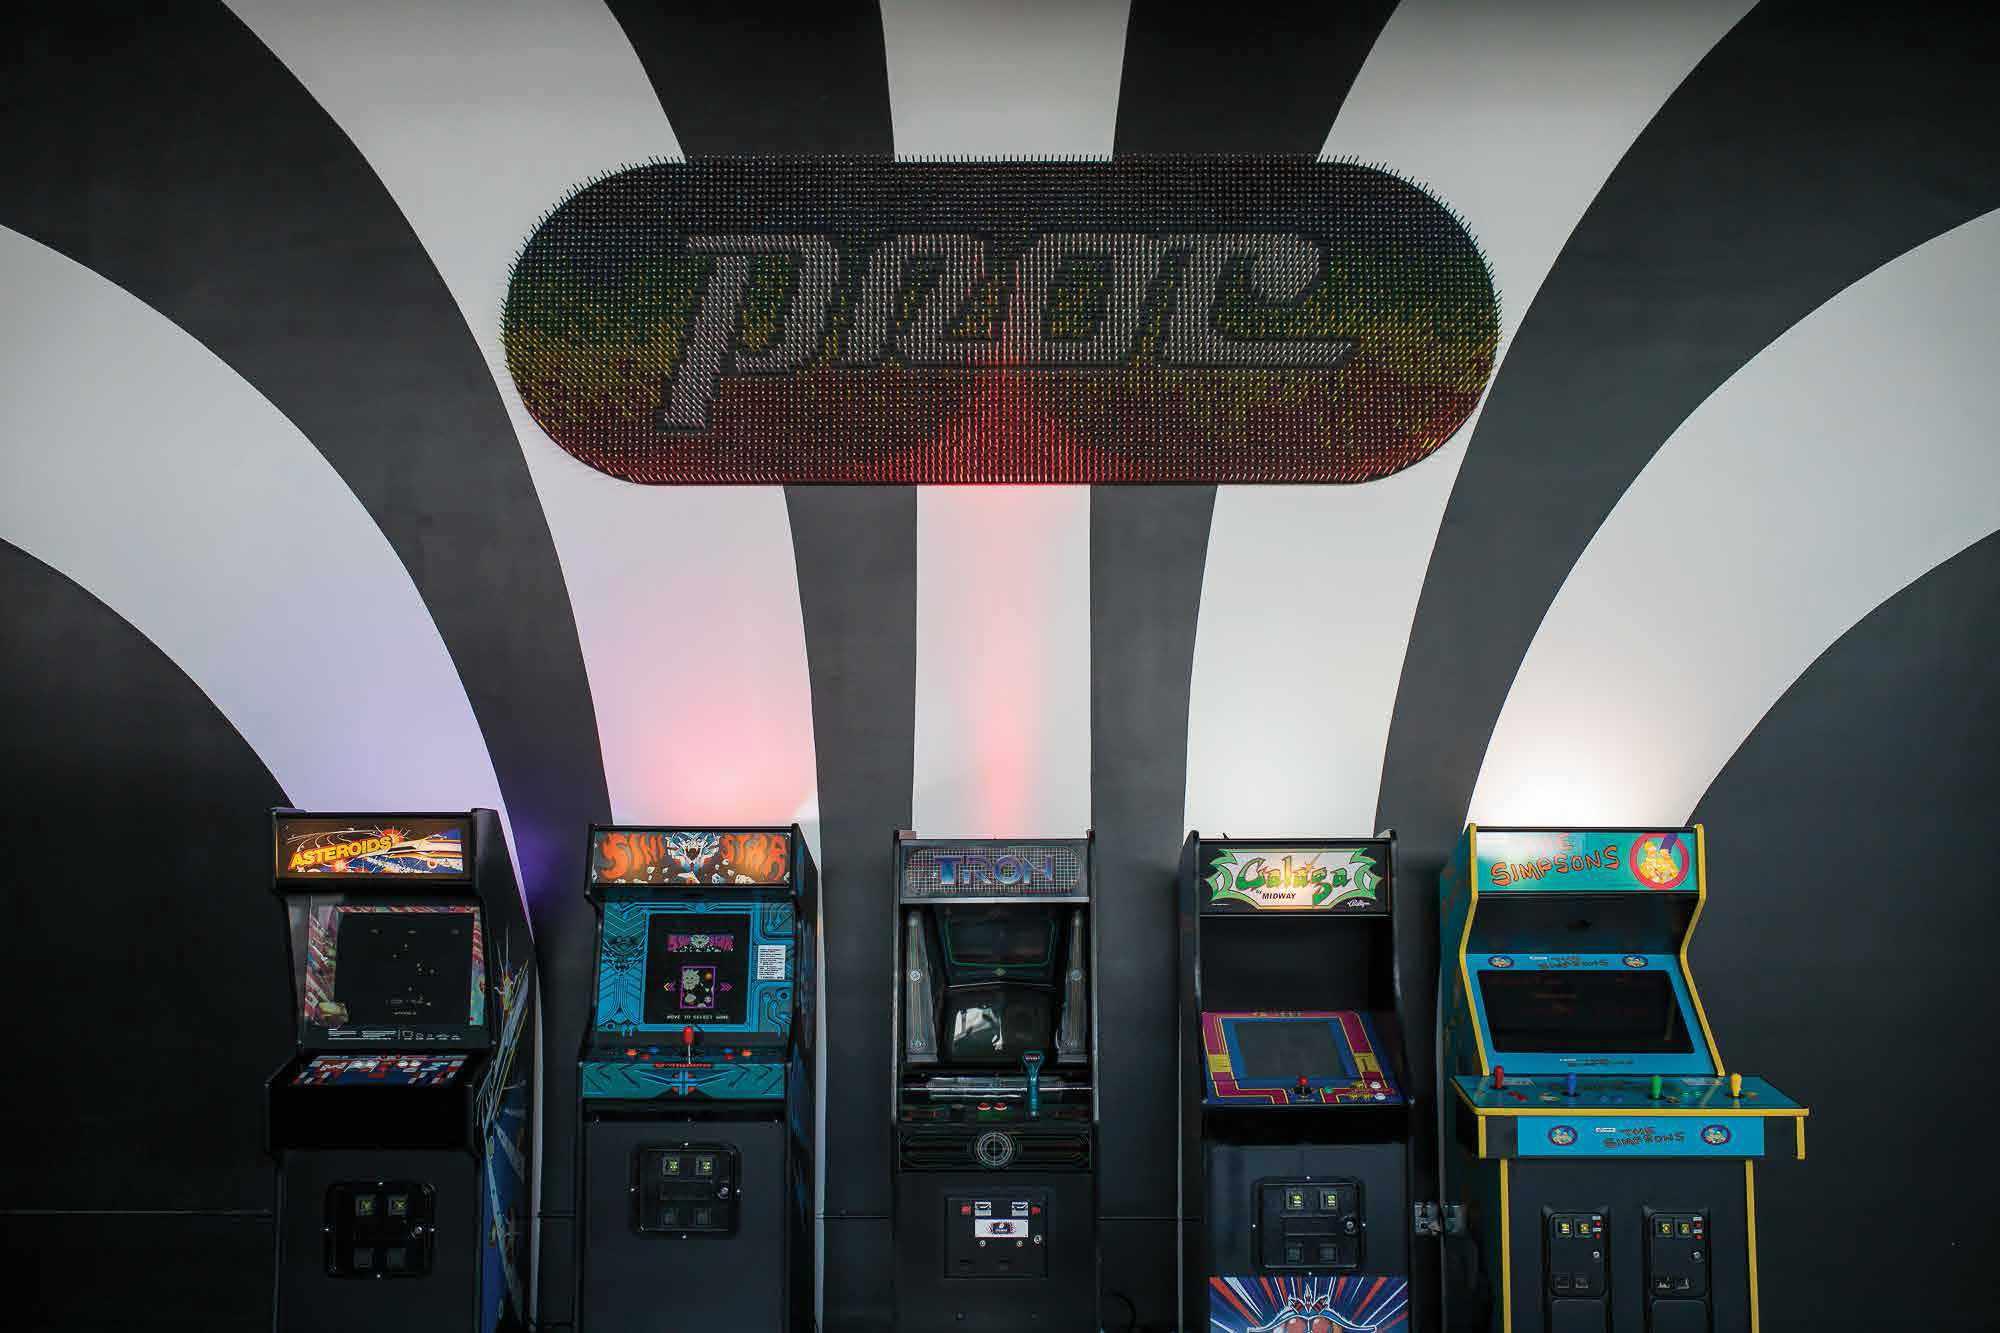 Proclamation Ale Company's arcade wall